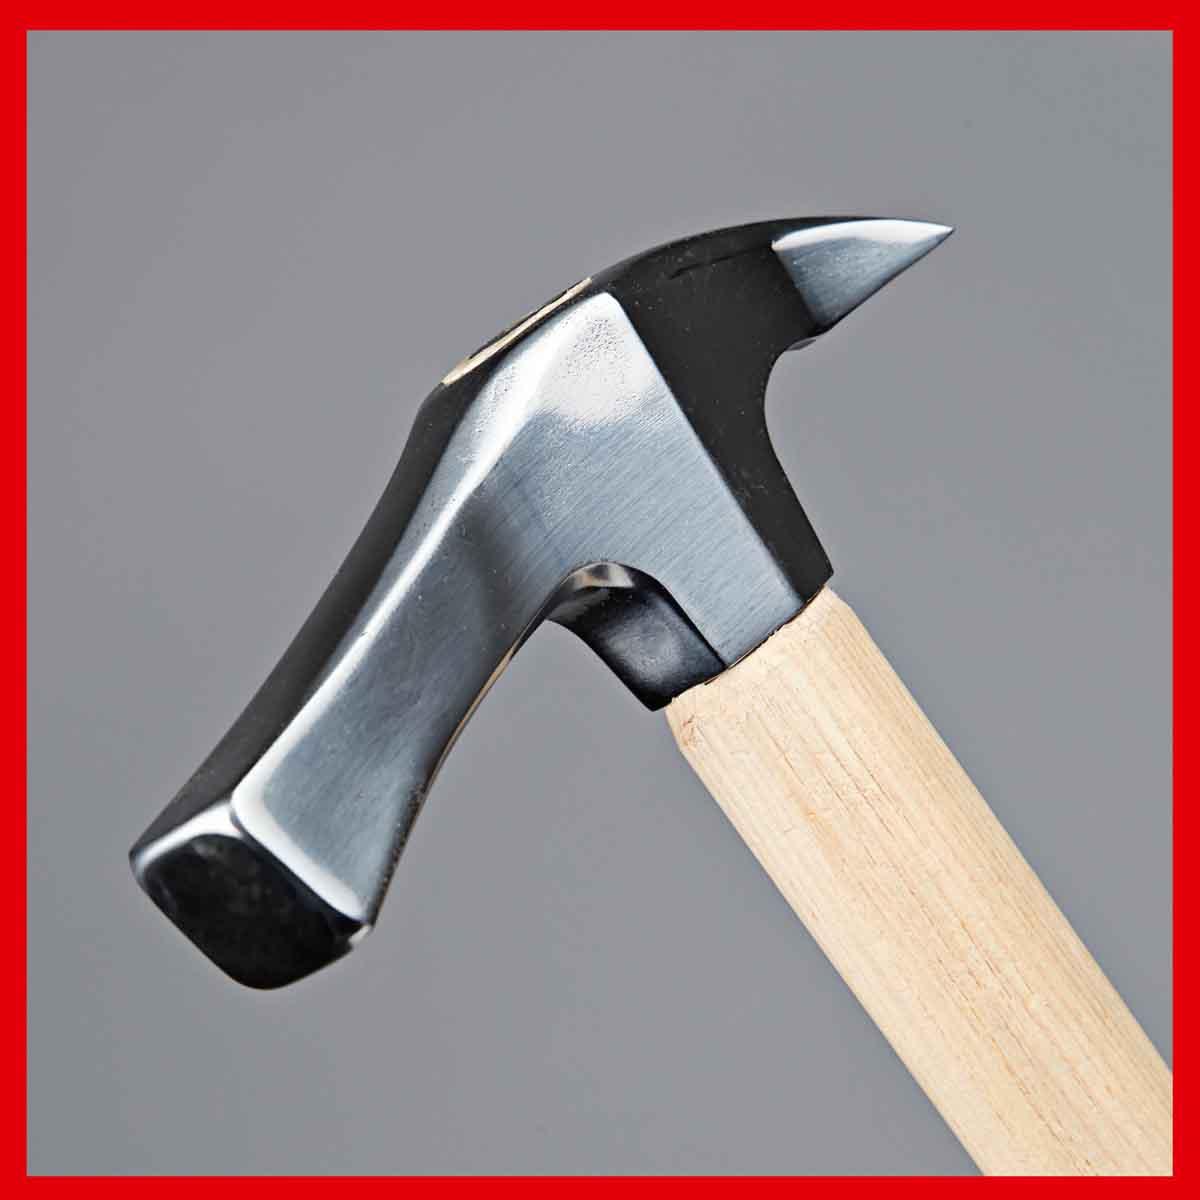 Jon Nunn Nailing Hammers